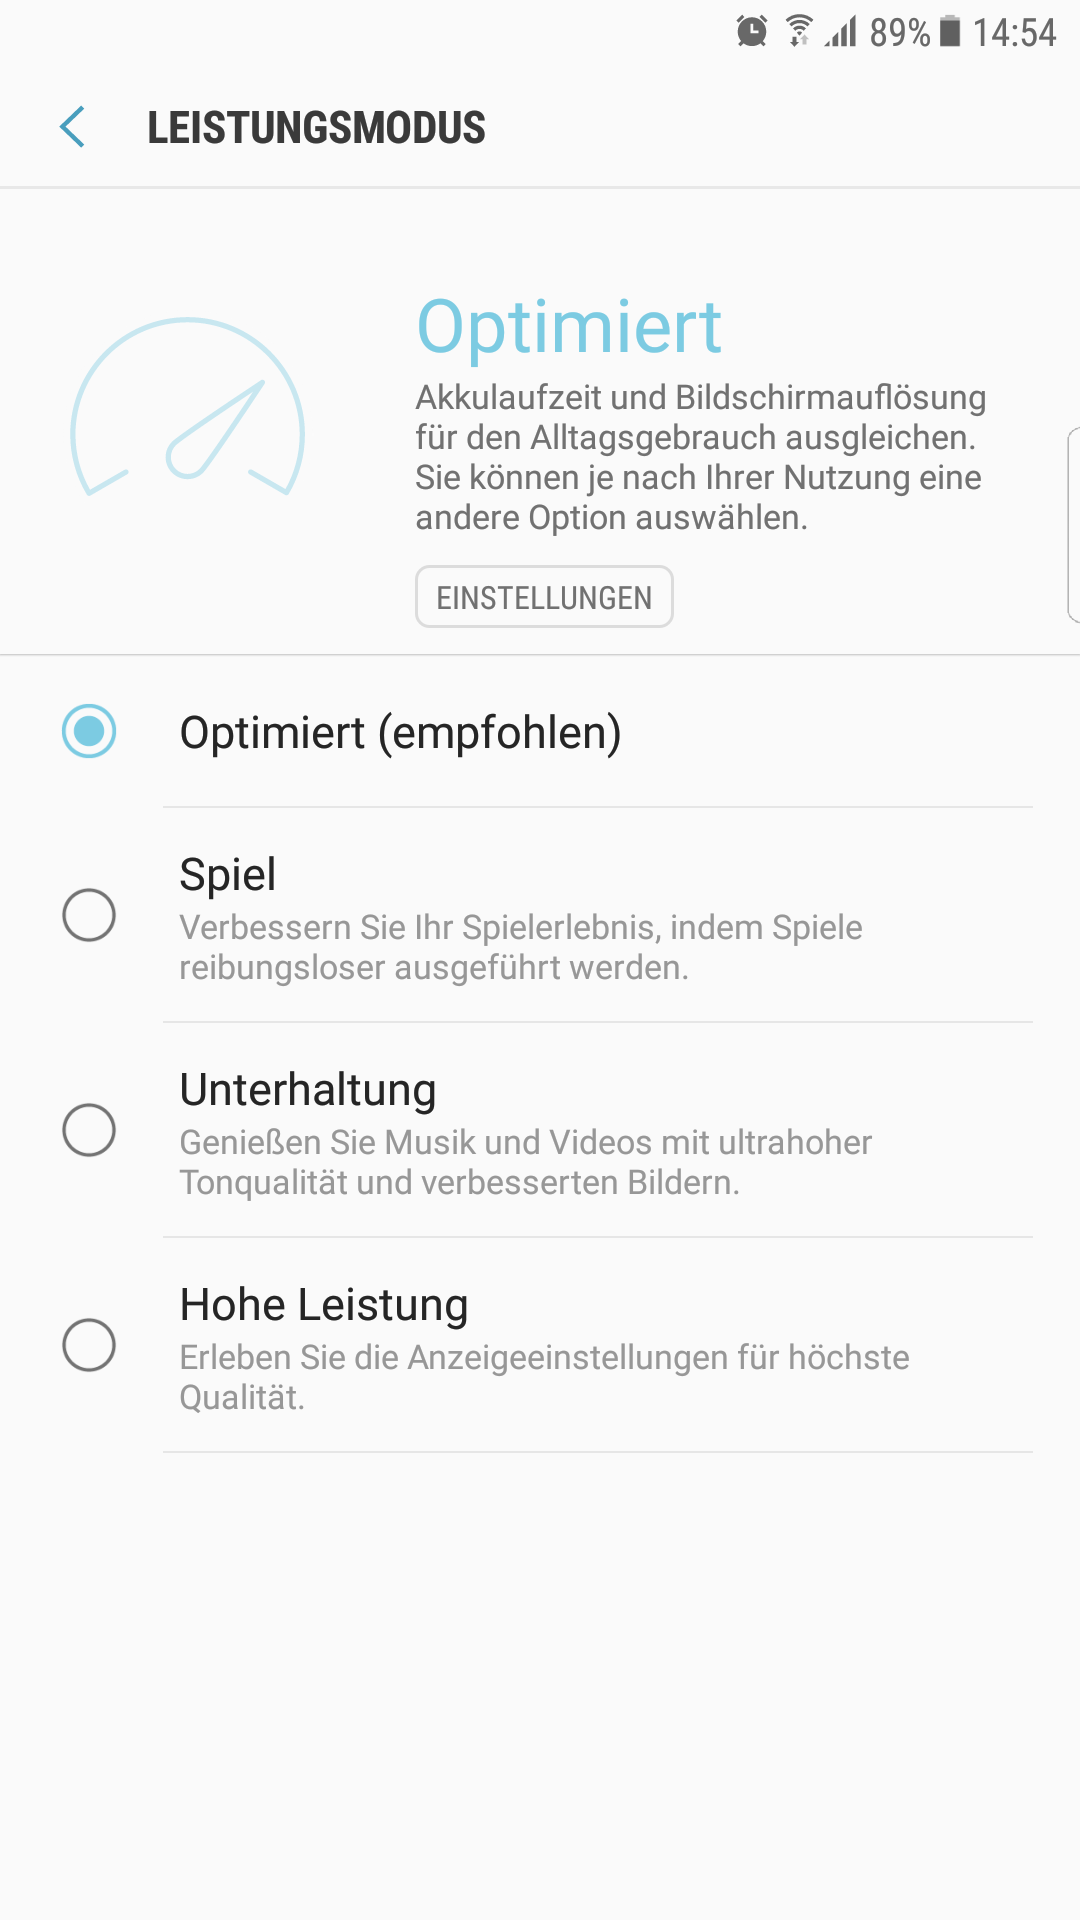 Samsung Galaxy S7 Android 7.0 Leistungsmodus